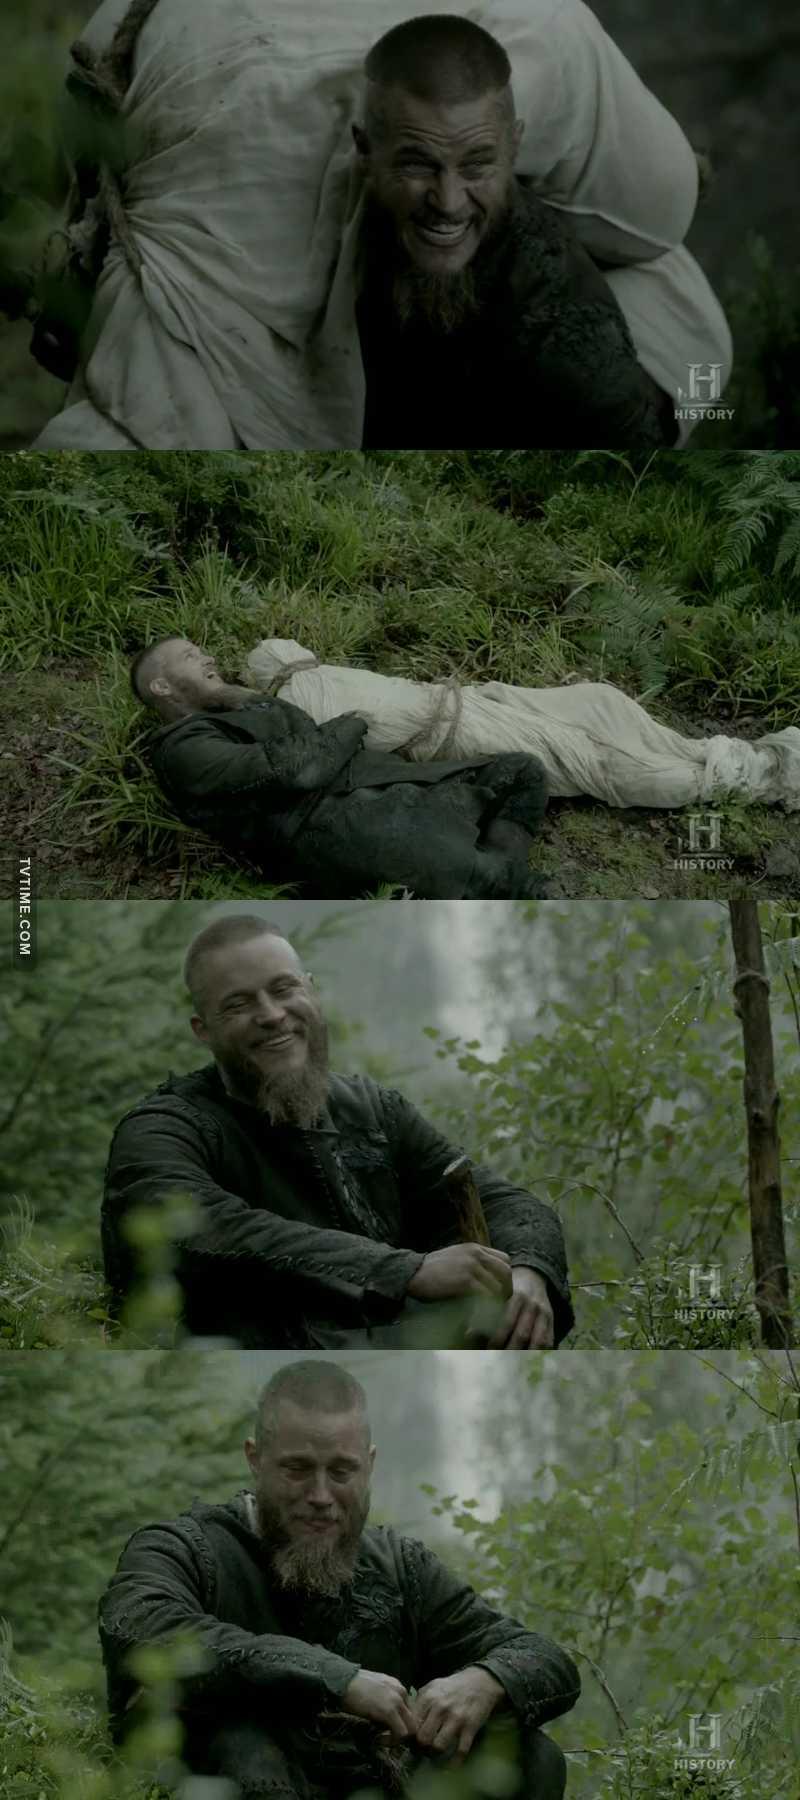 This scene deeply saddened me 💔